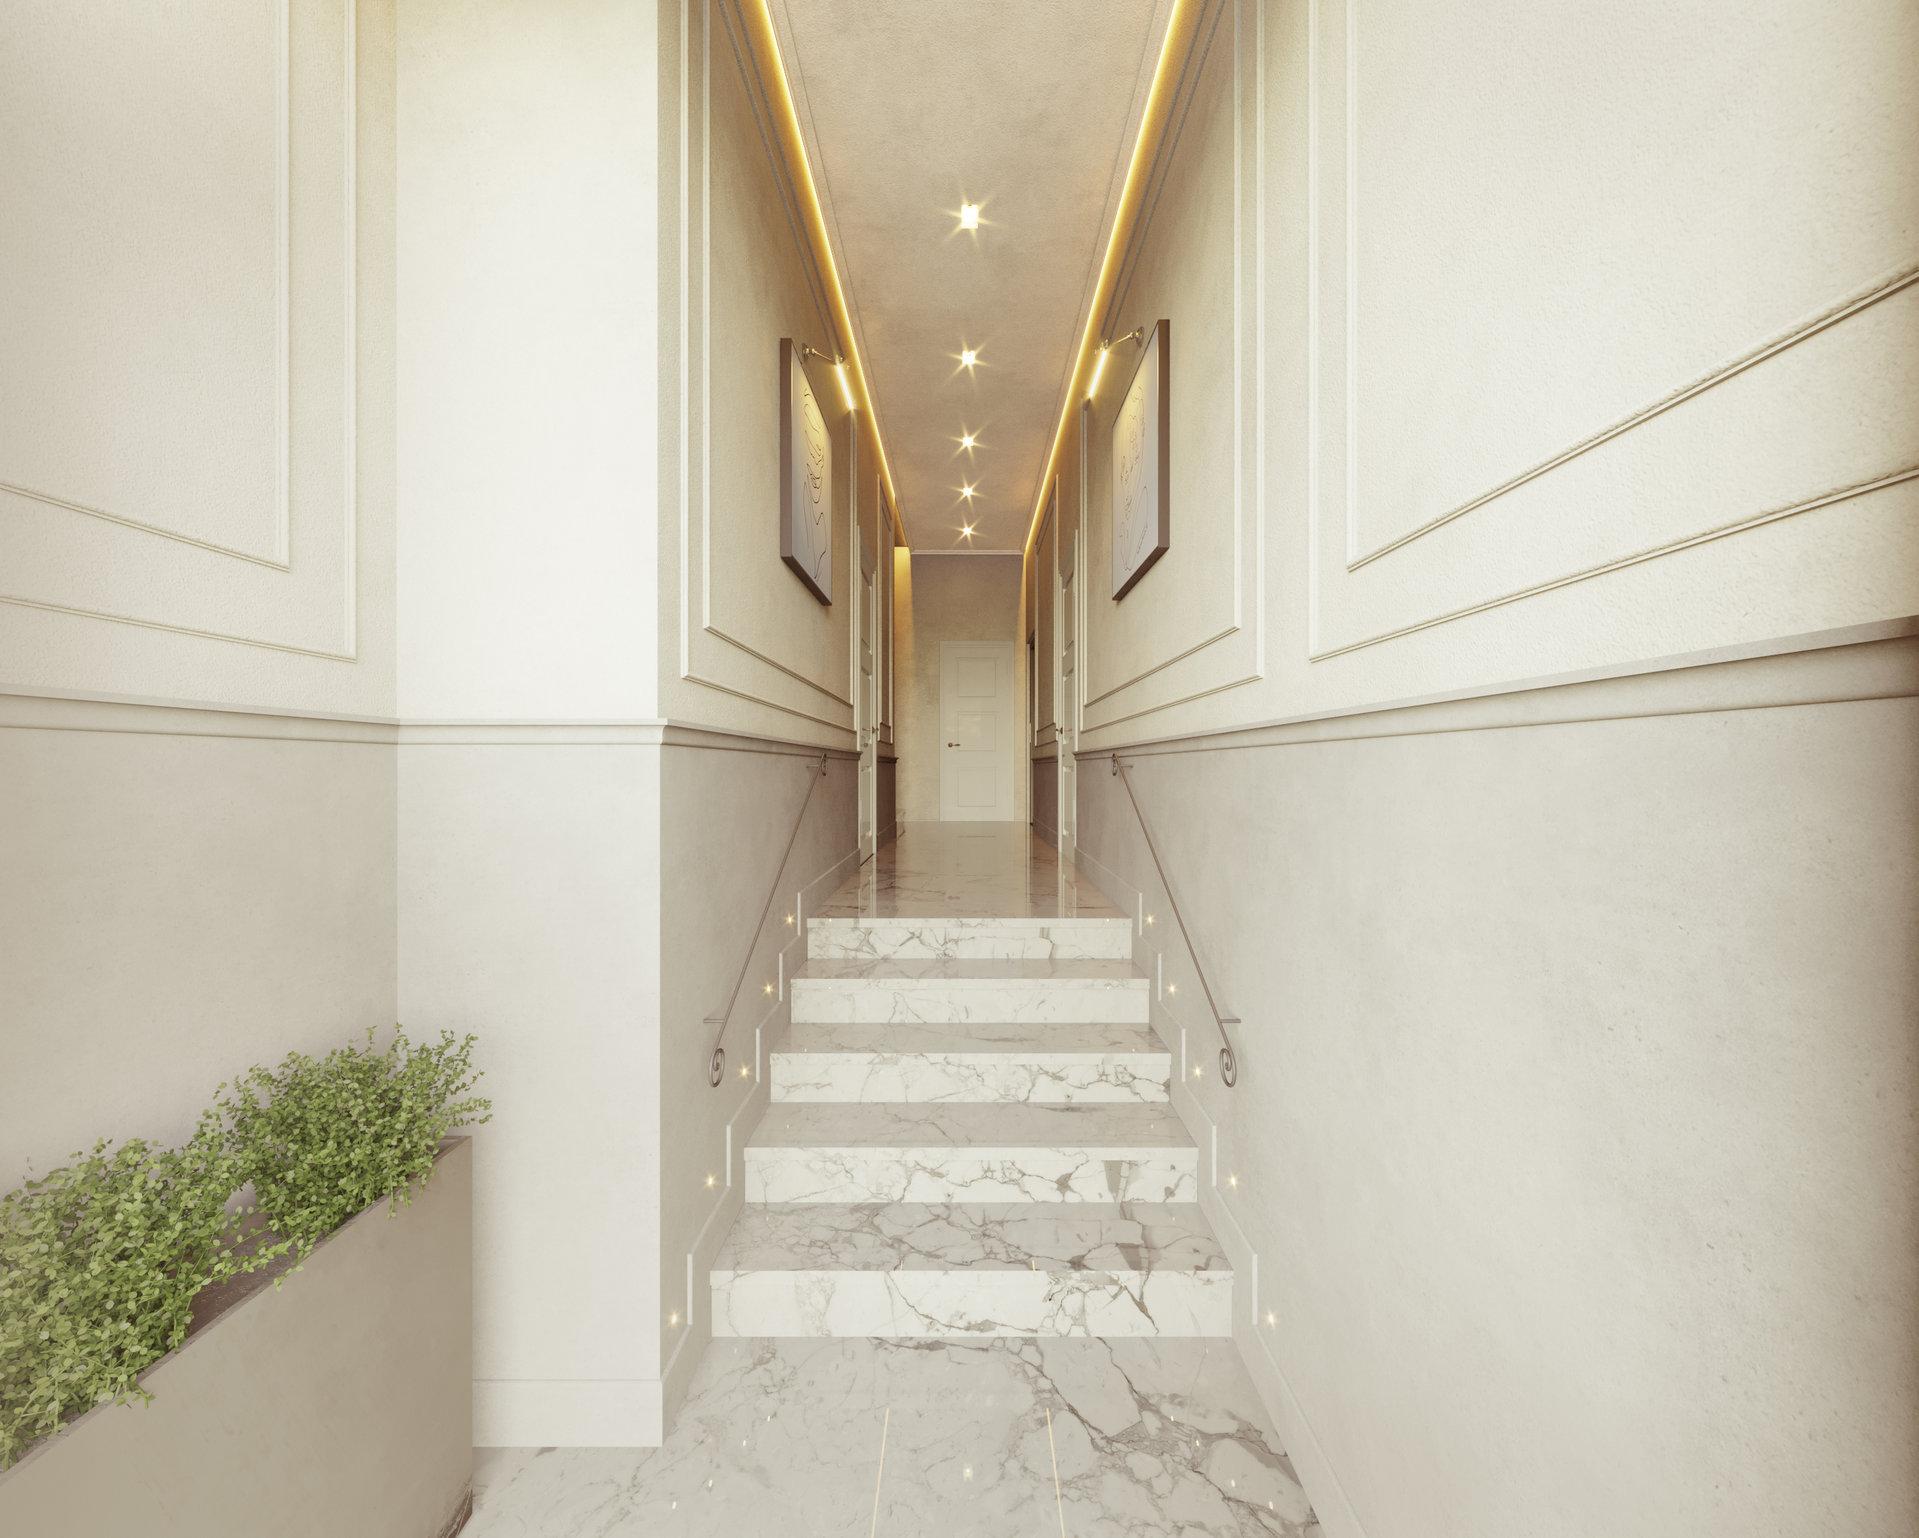 Sale Apartment Florence Bolognese